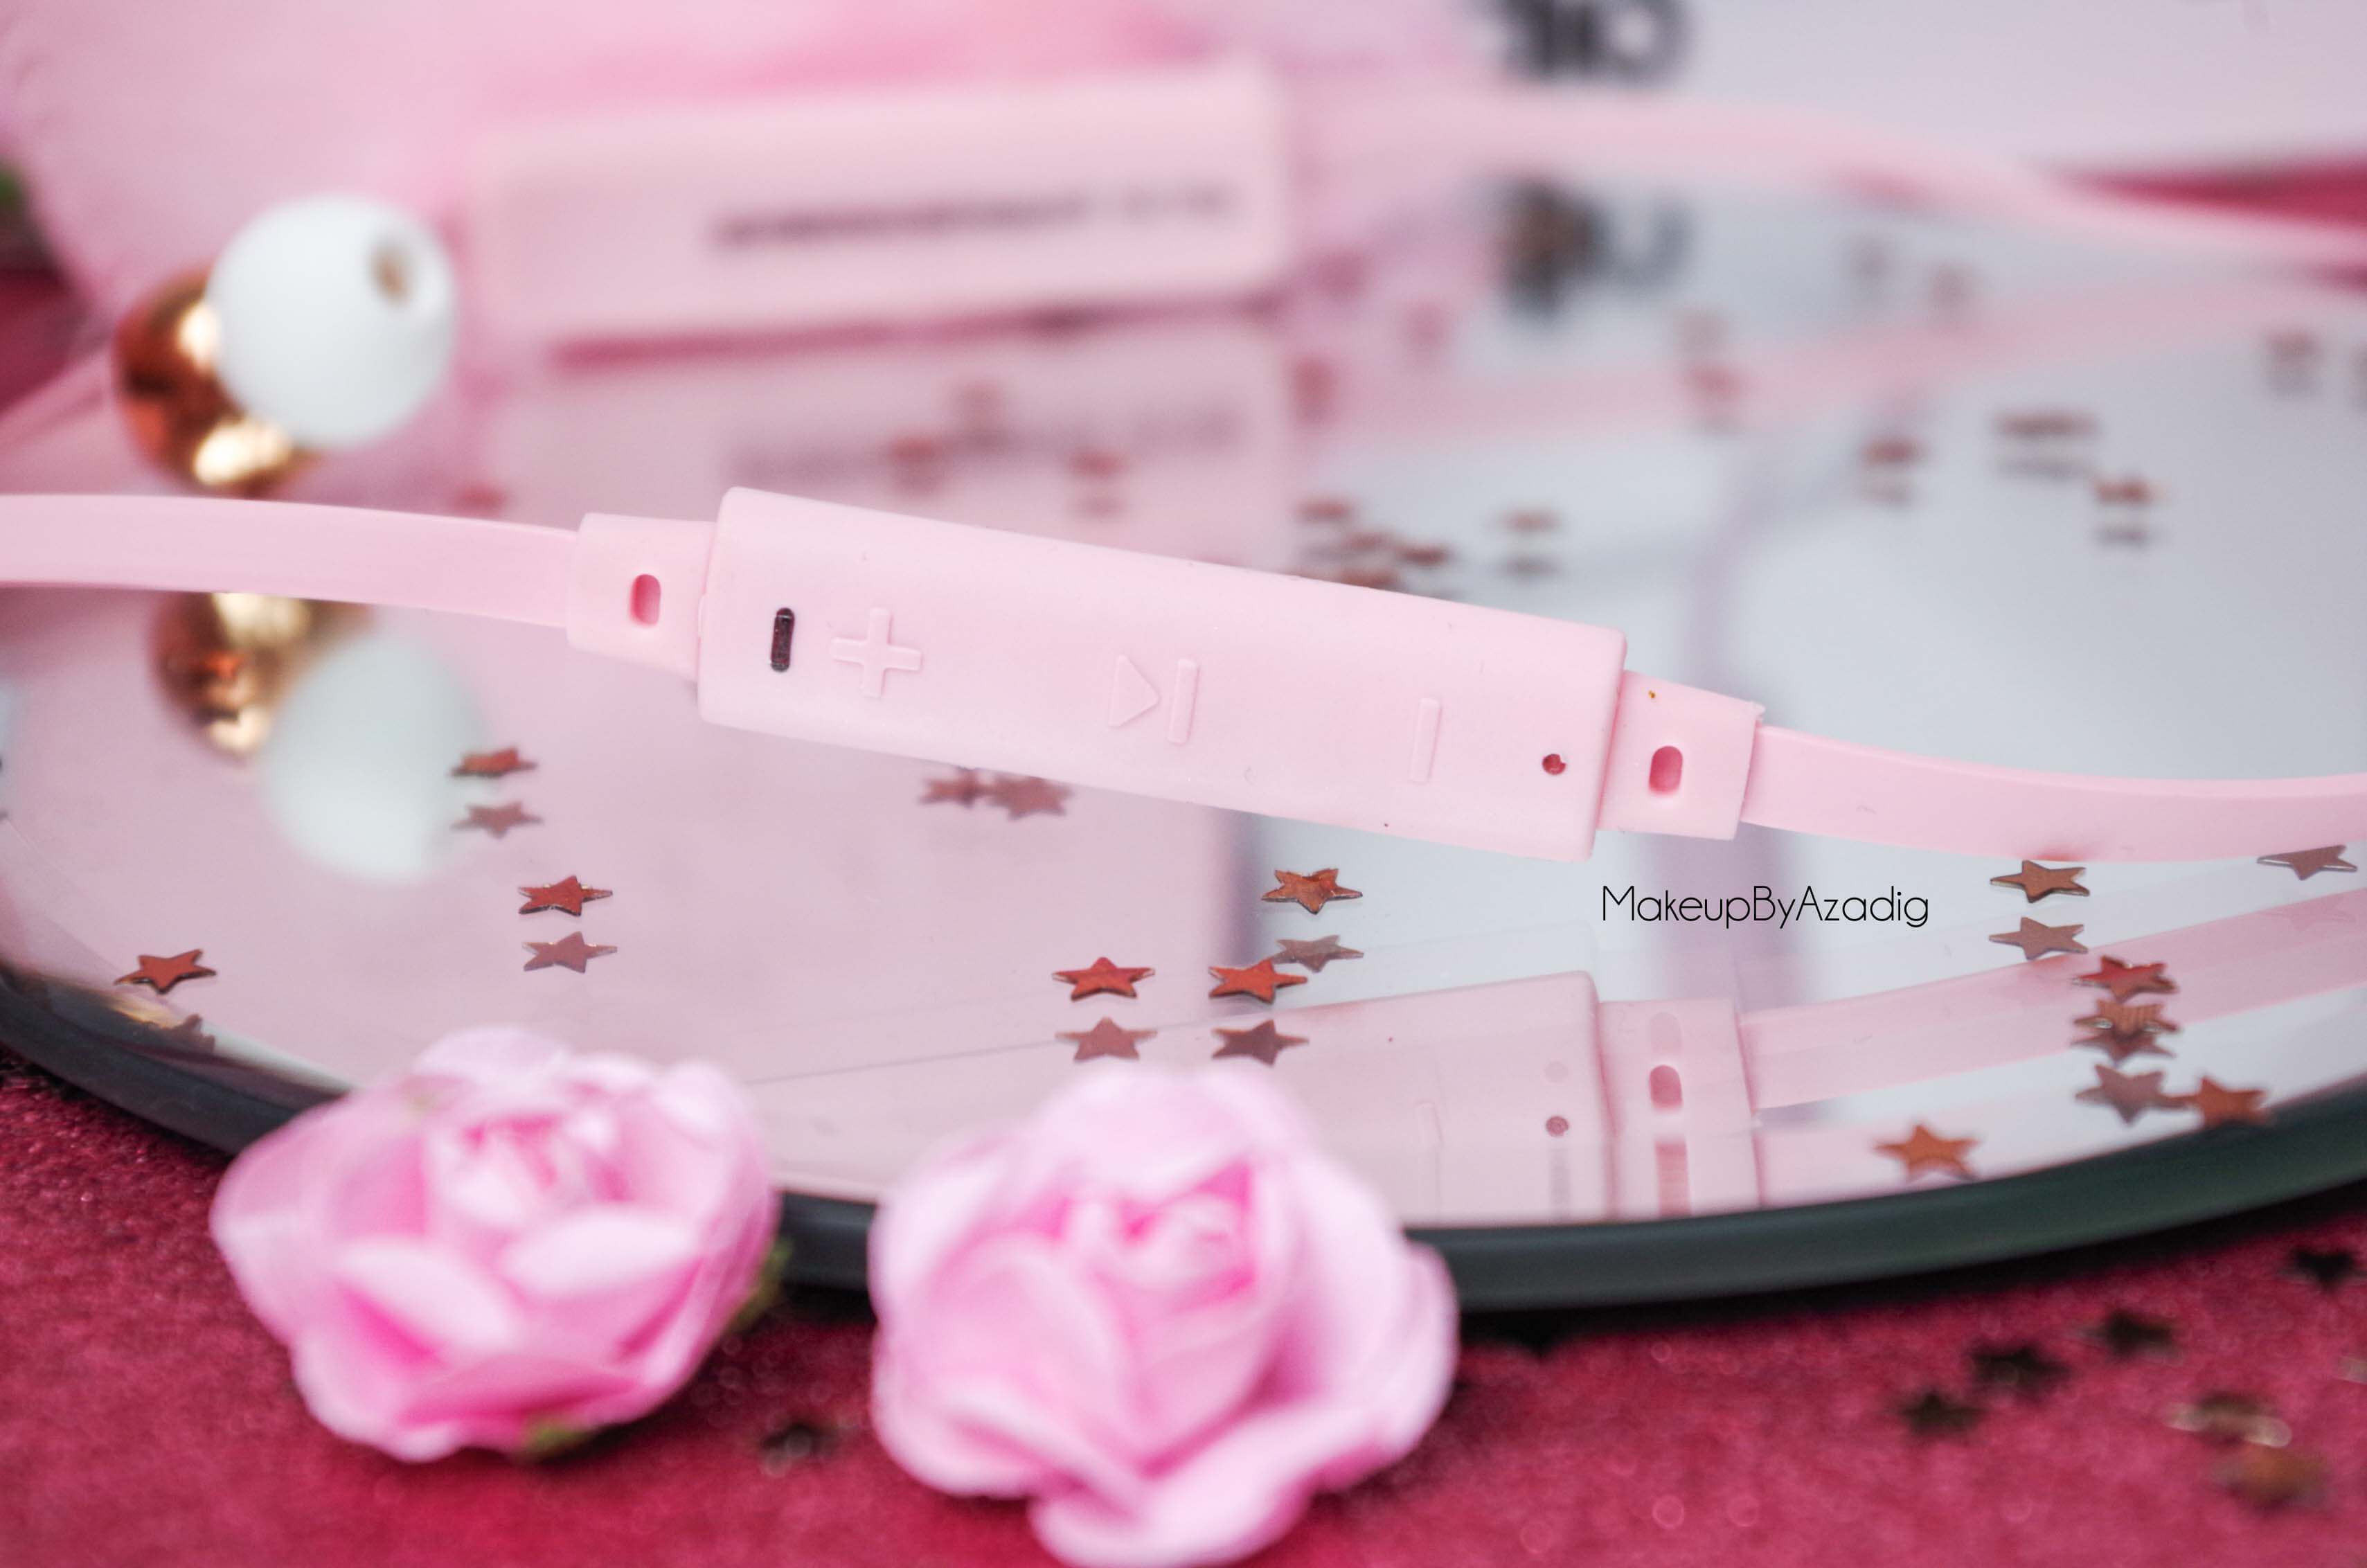 ecouteurs-casque-sans-fil-bluetooth-design-tendance-sudio-sweden-rose-vasa-bla-makeupbyazadig-avis-prix-rose